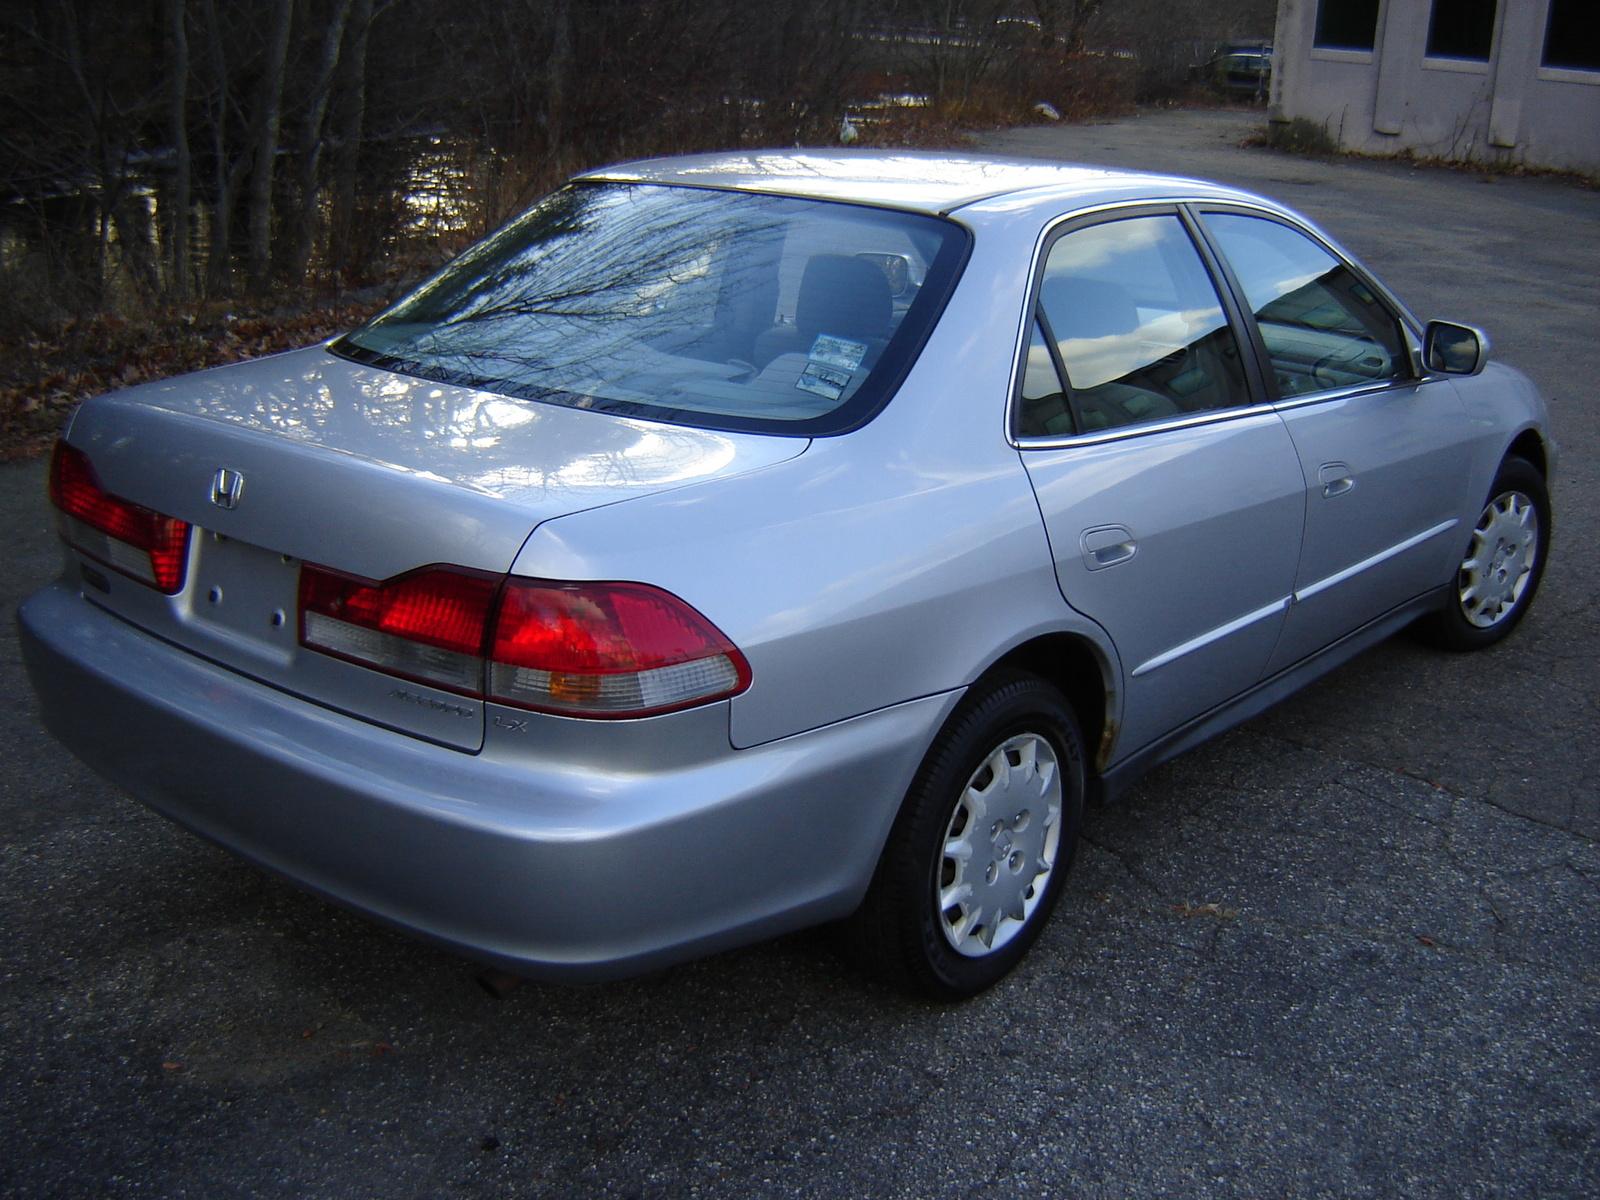 1999 Accord Honda Specs V6